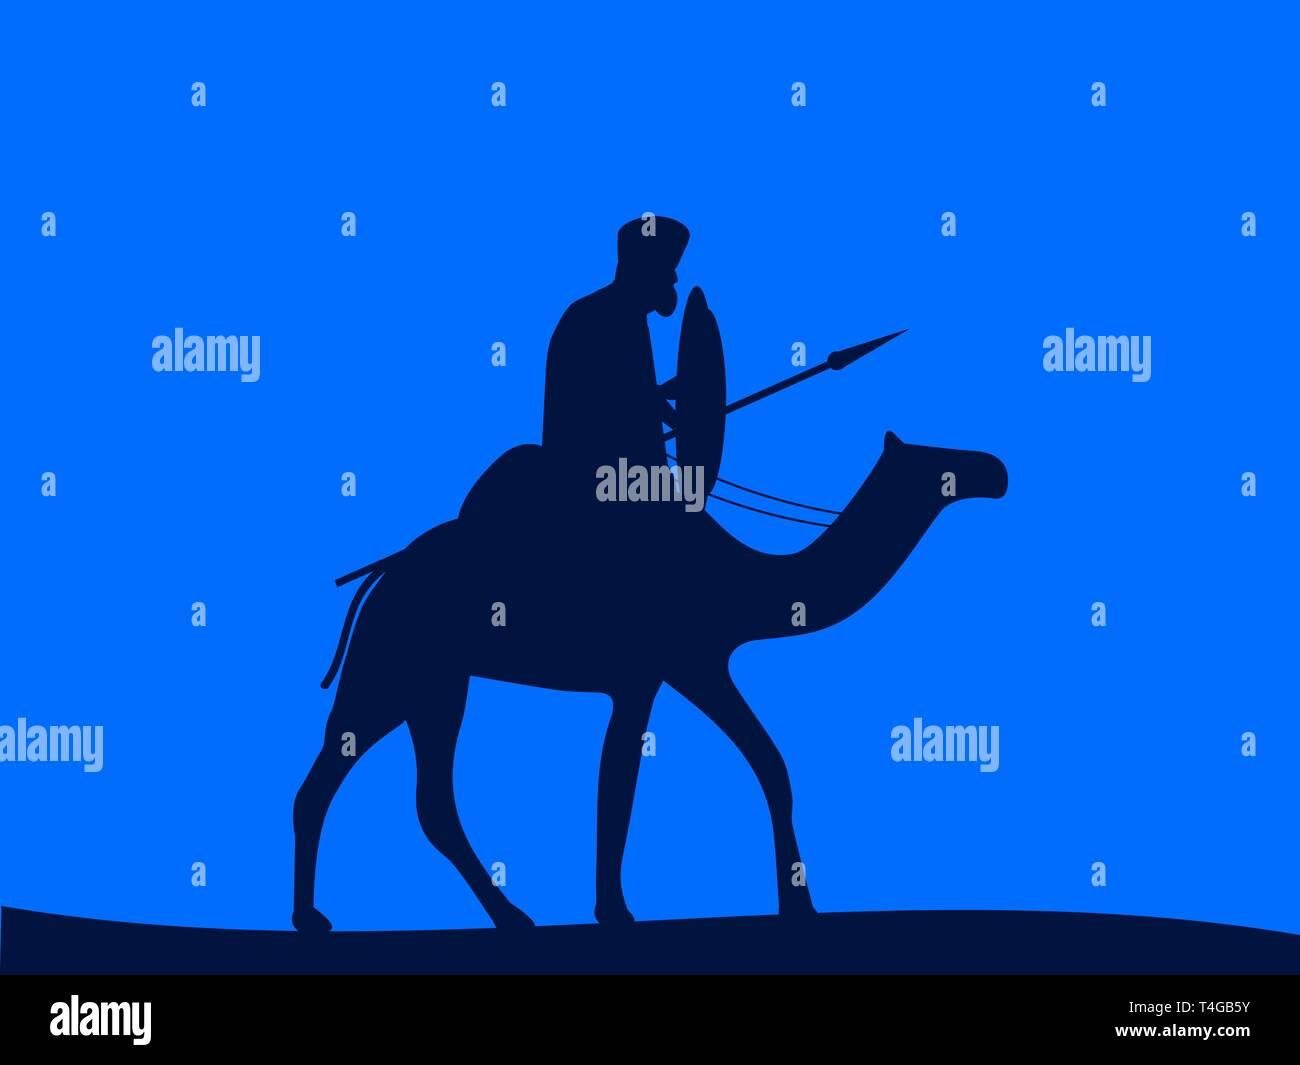 Camel cavalry. Armed rider on a camel. Vector illustration - Stock Vector